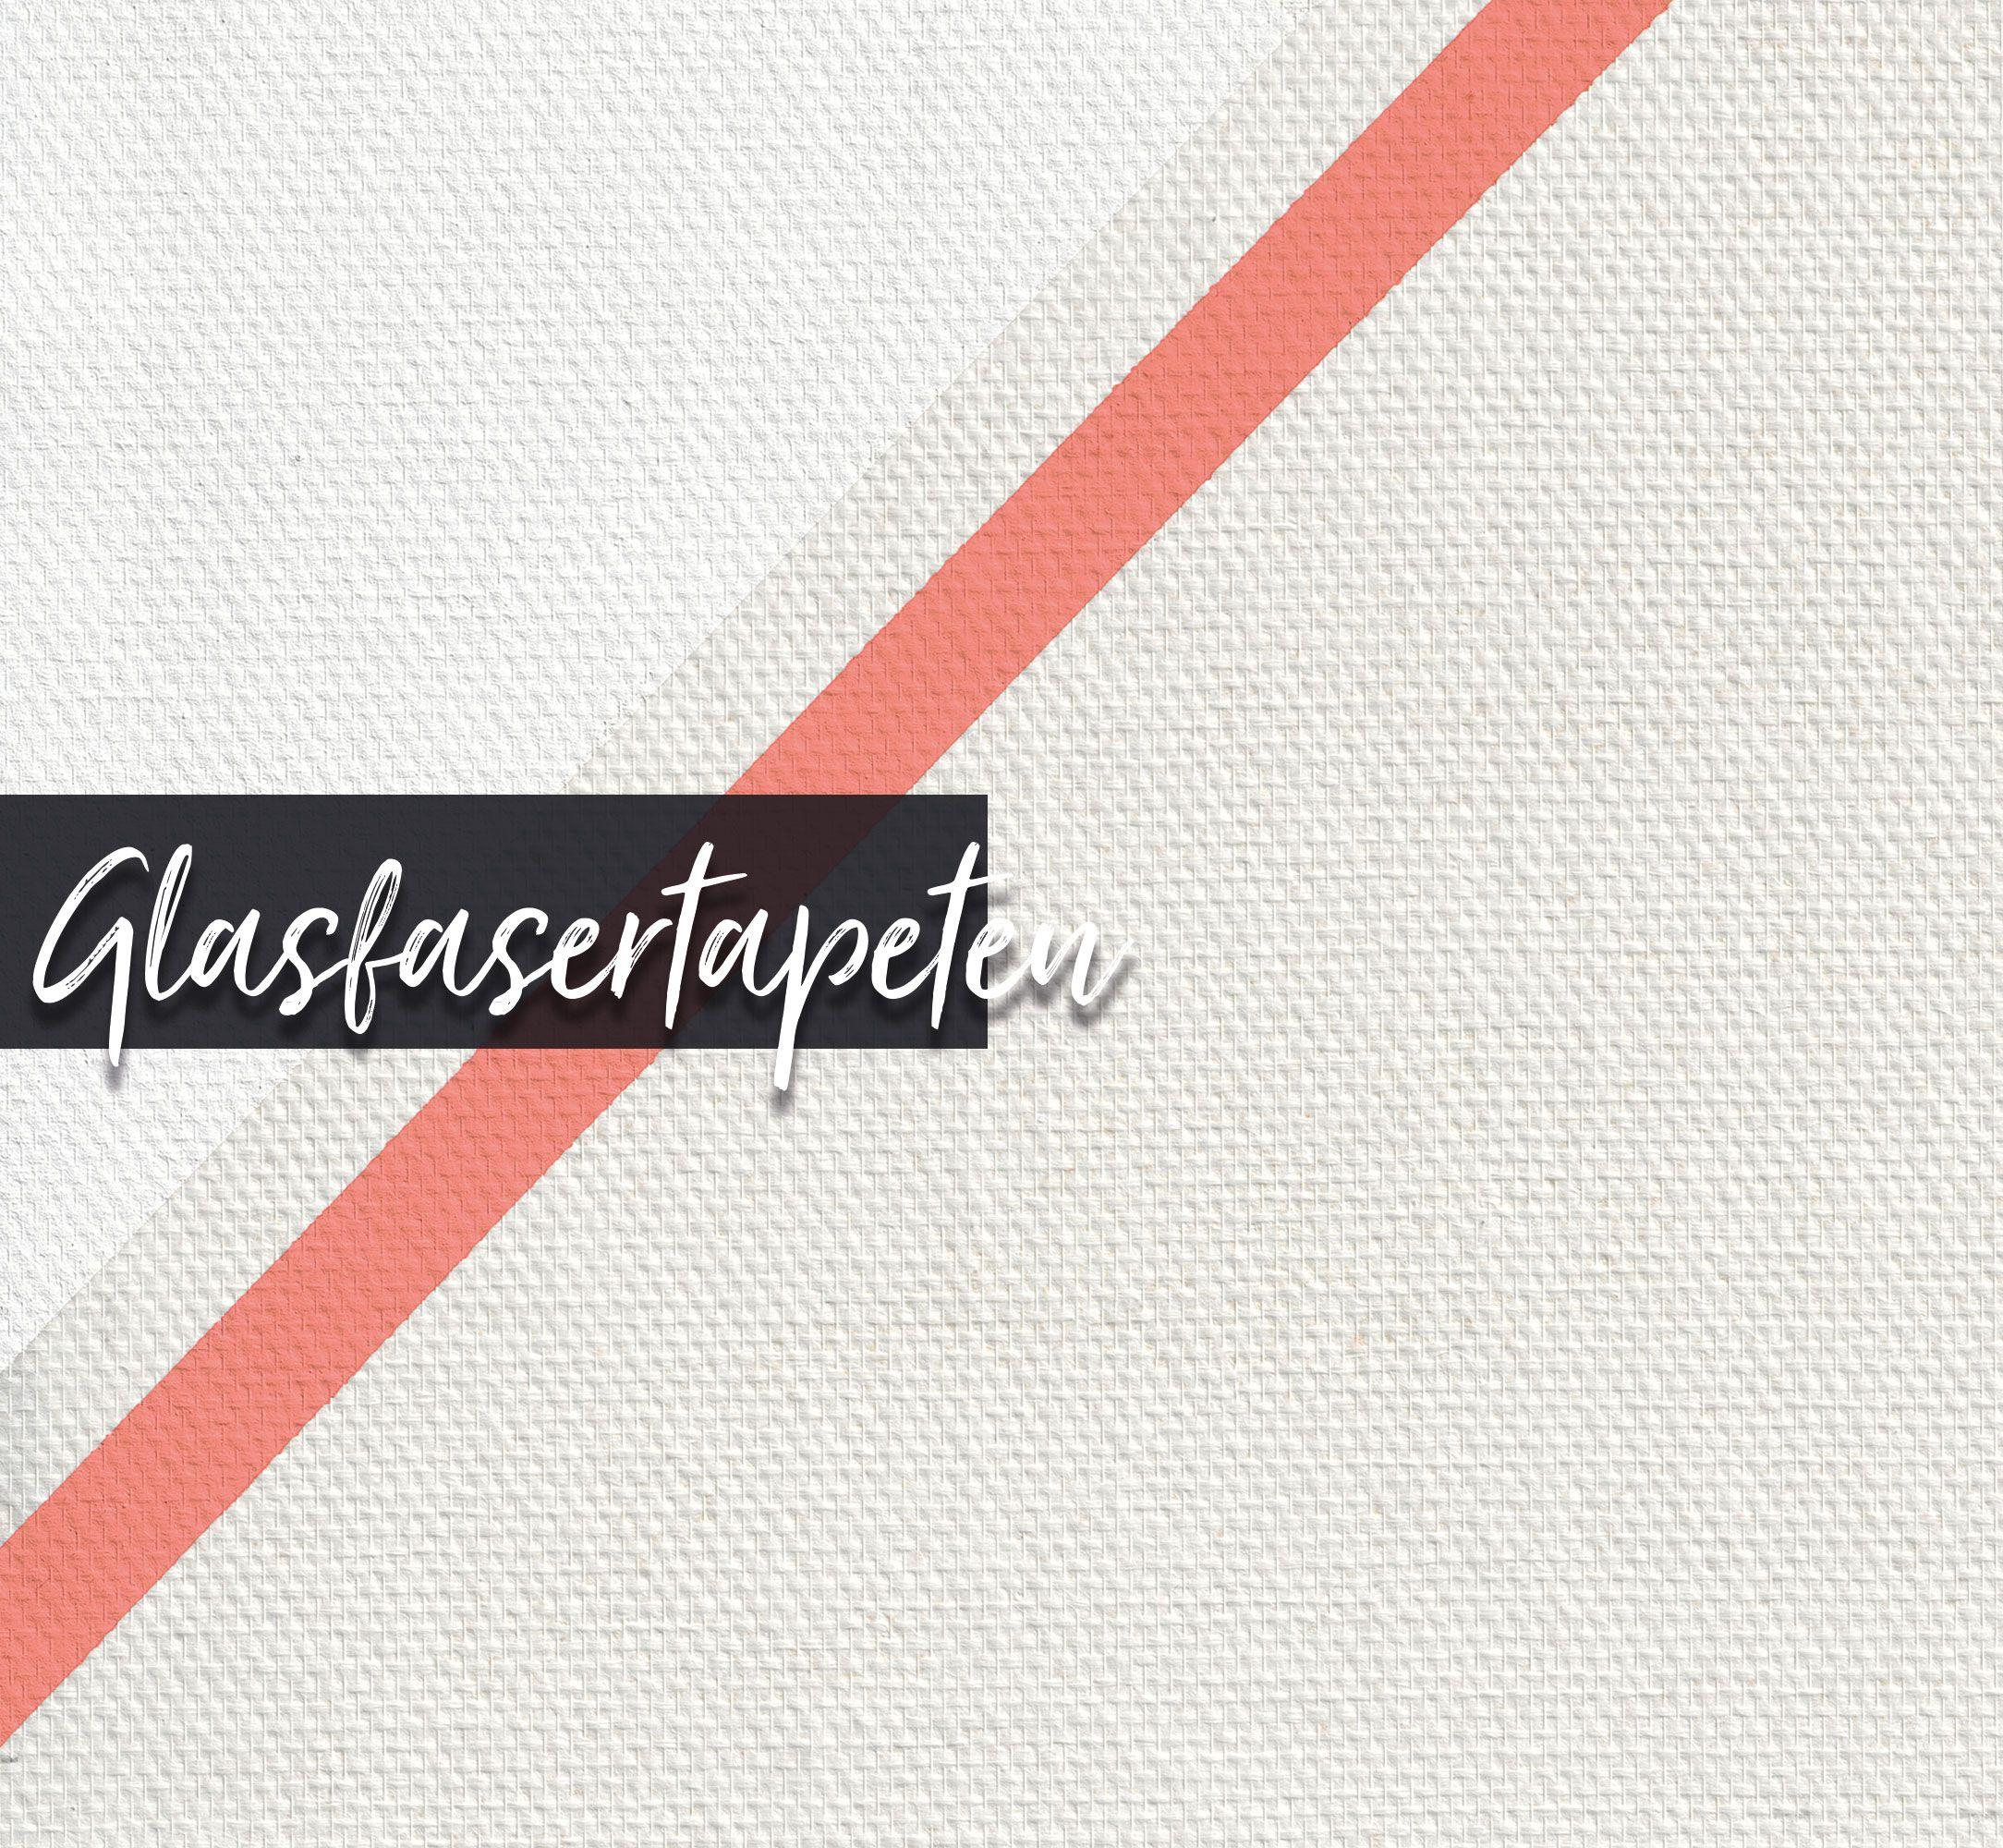 Glasfasertapeten-AS090321